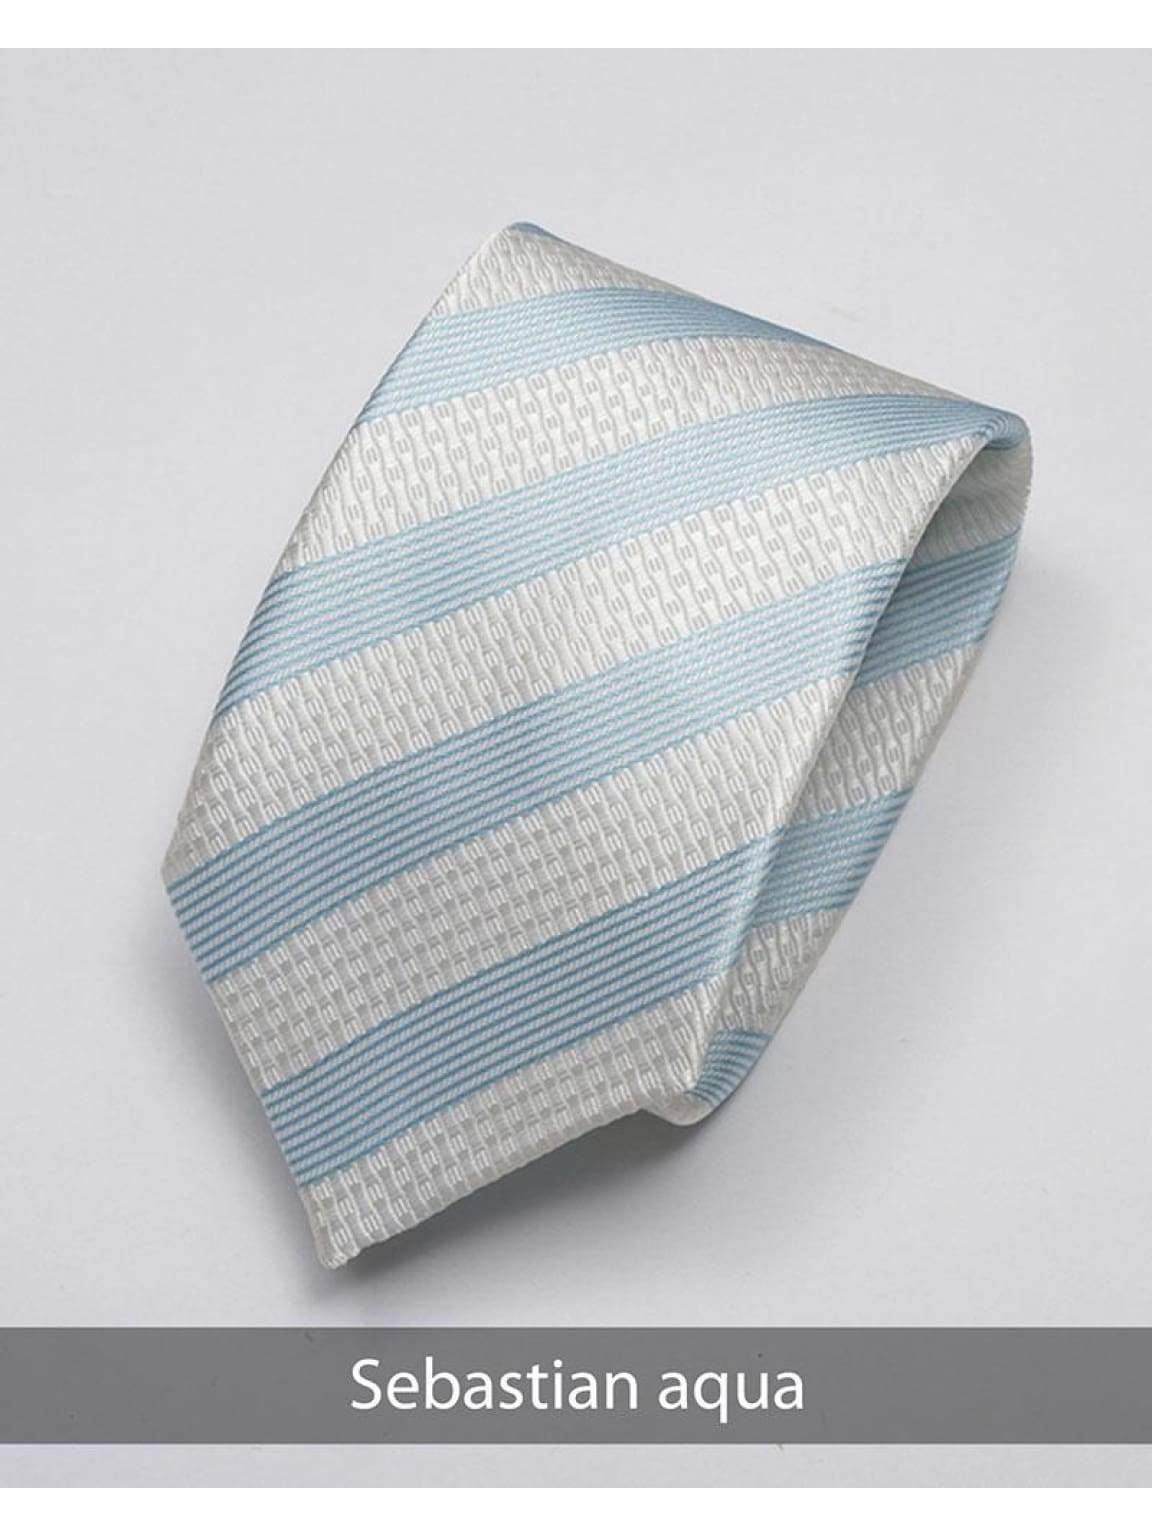 Heirloom salvadore Mens Aqua Stripped Tie - Accessories